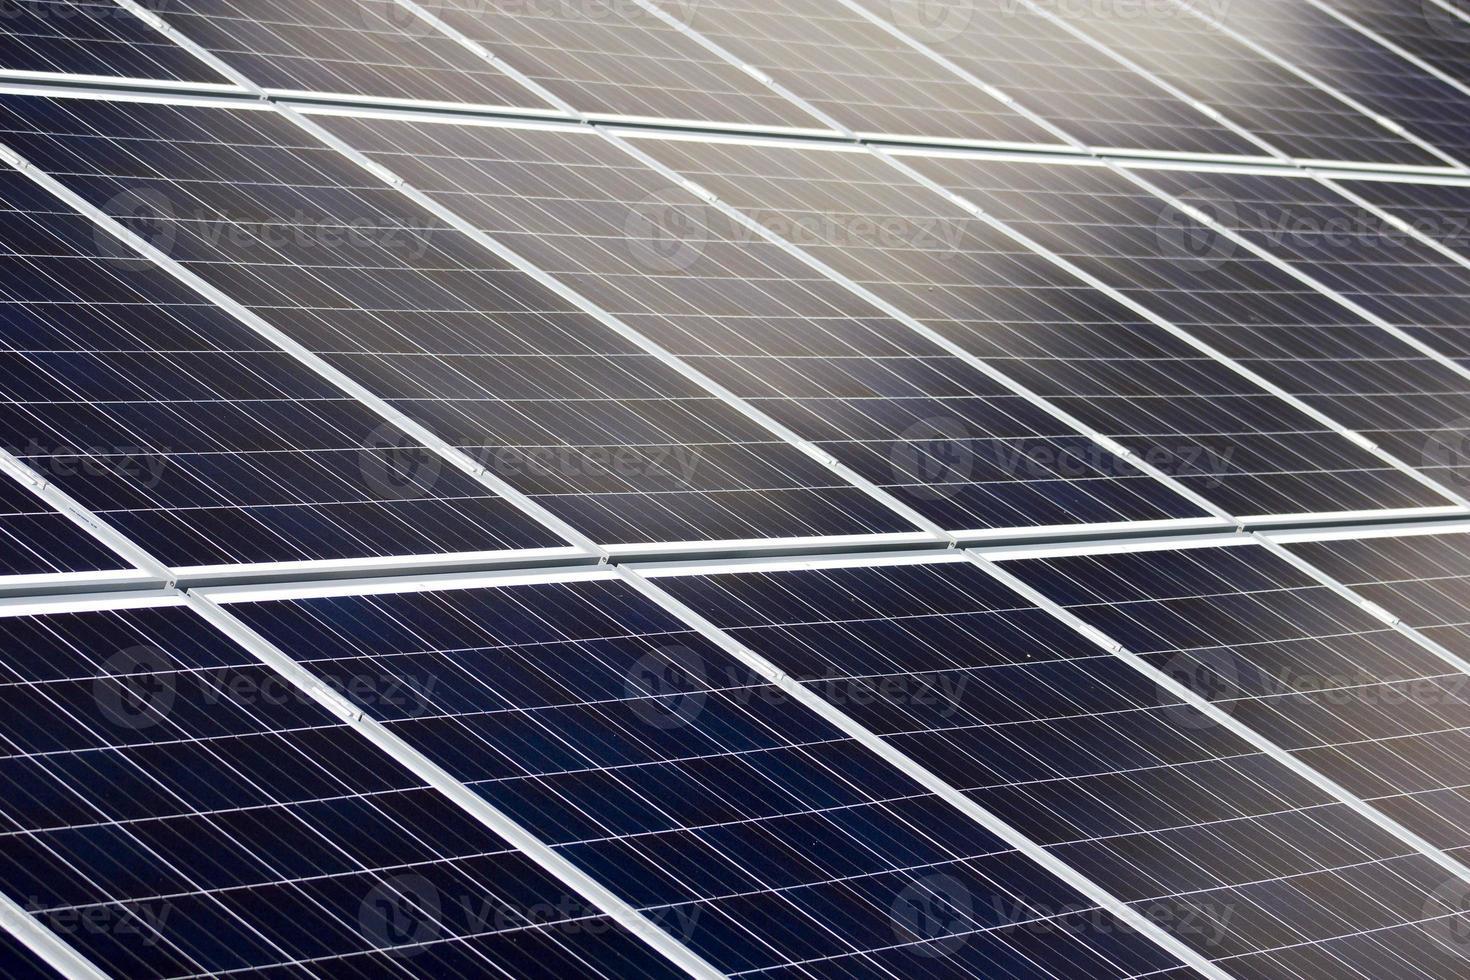 pannelli solari blu foto